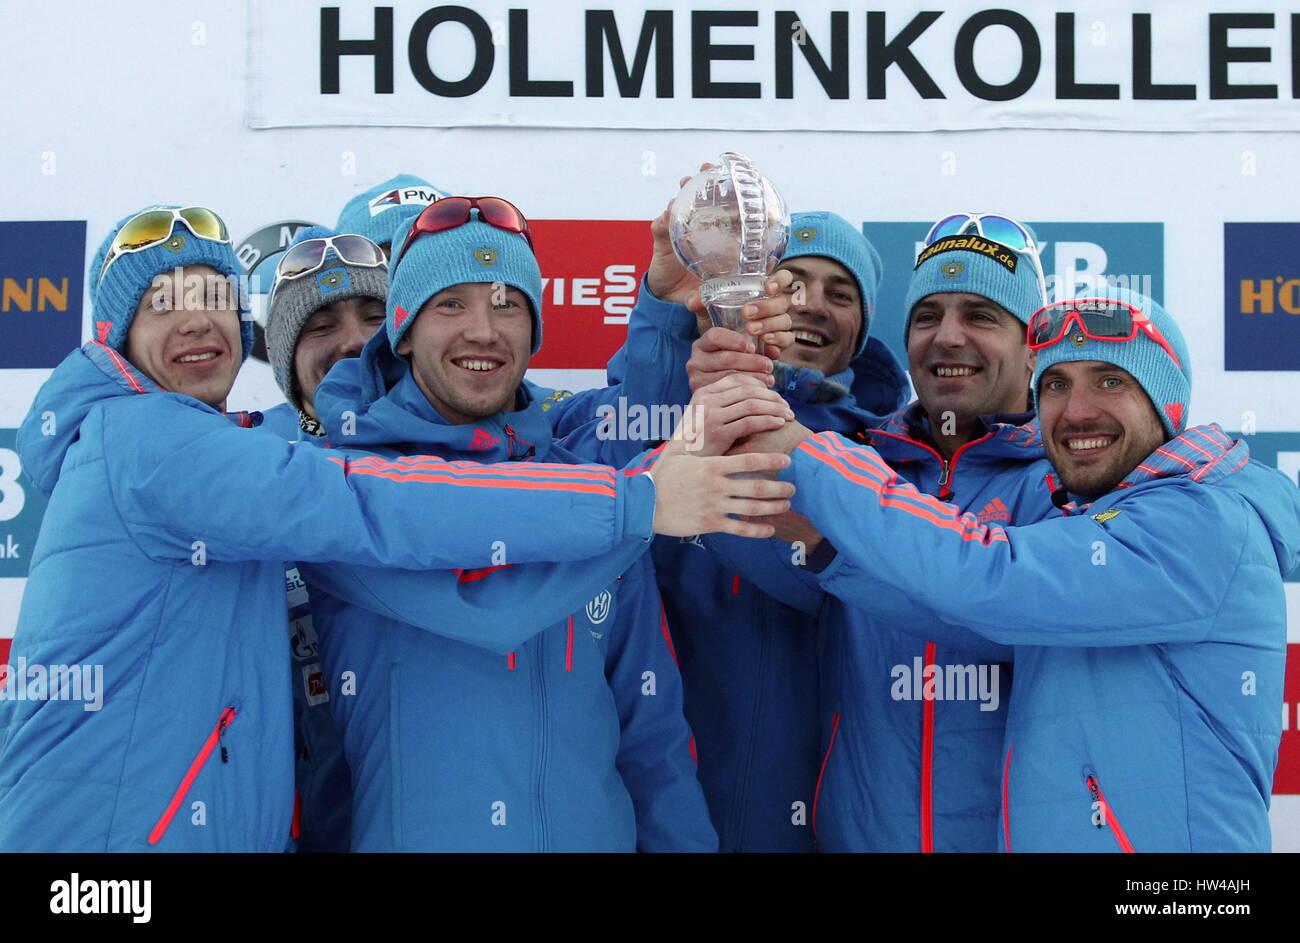 Holmenkollen, Norway. 17th Mar, 2017. Russia's biathletes Igor Malinovsky, Anton Babikov, senior coah Ricco - Stock Image